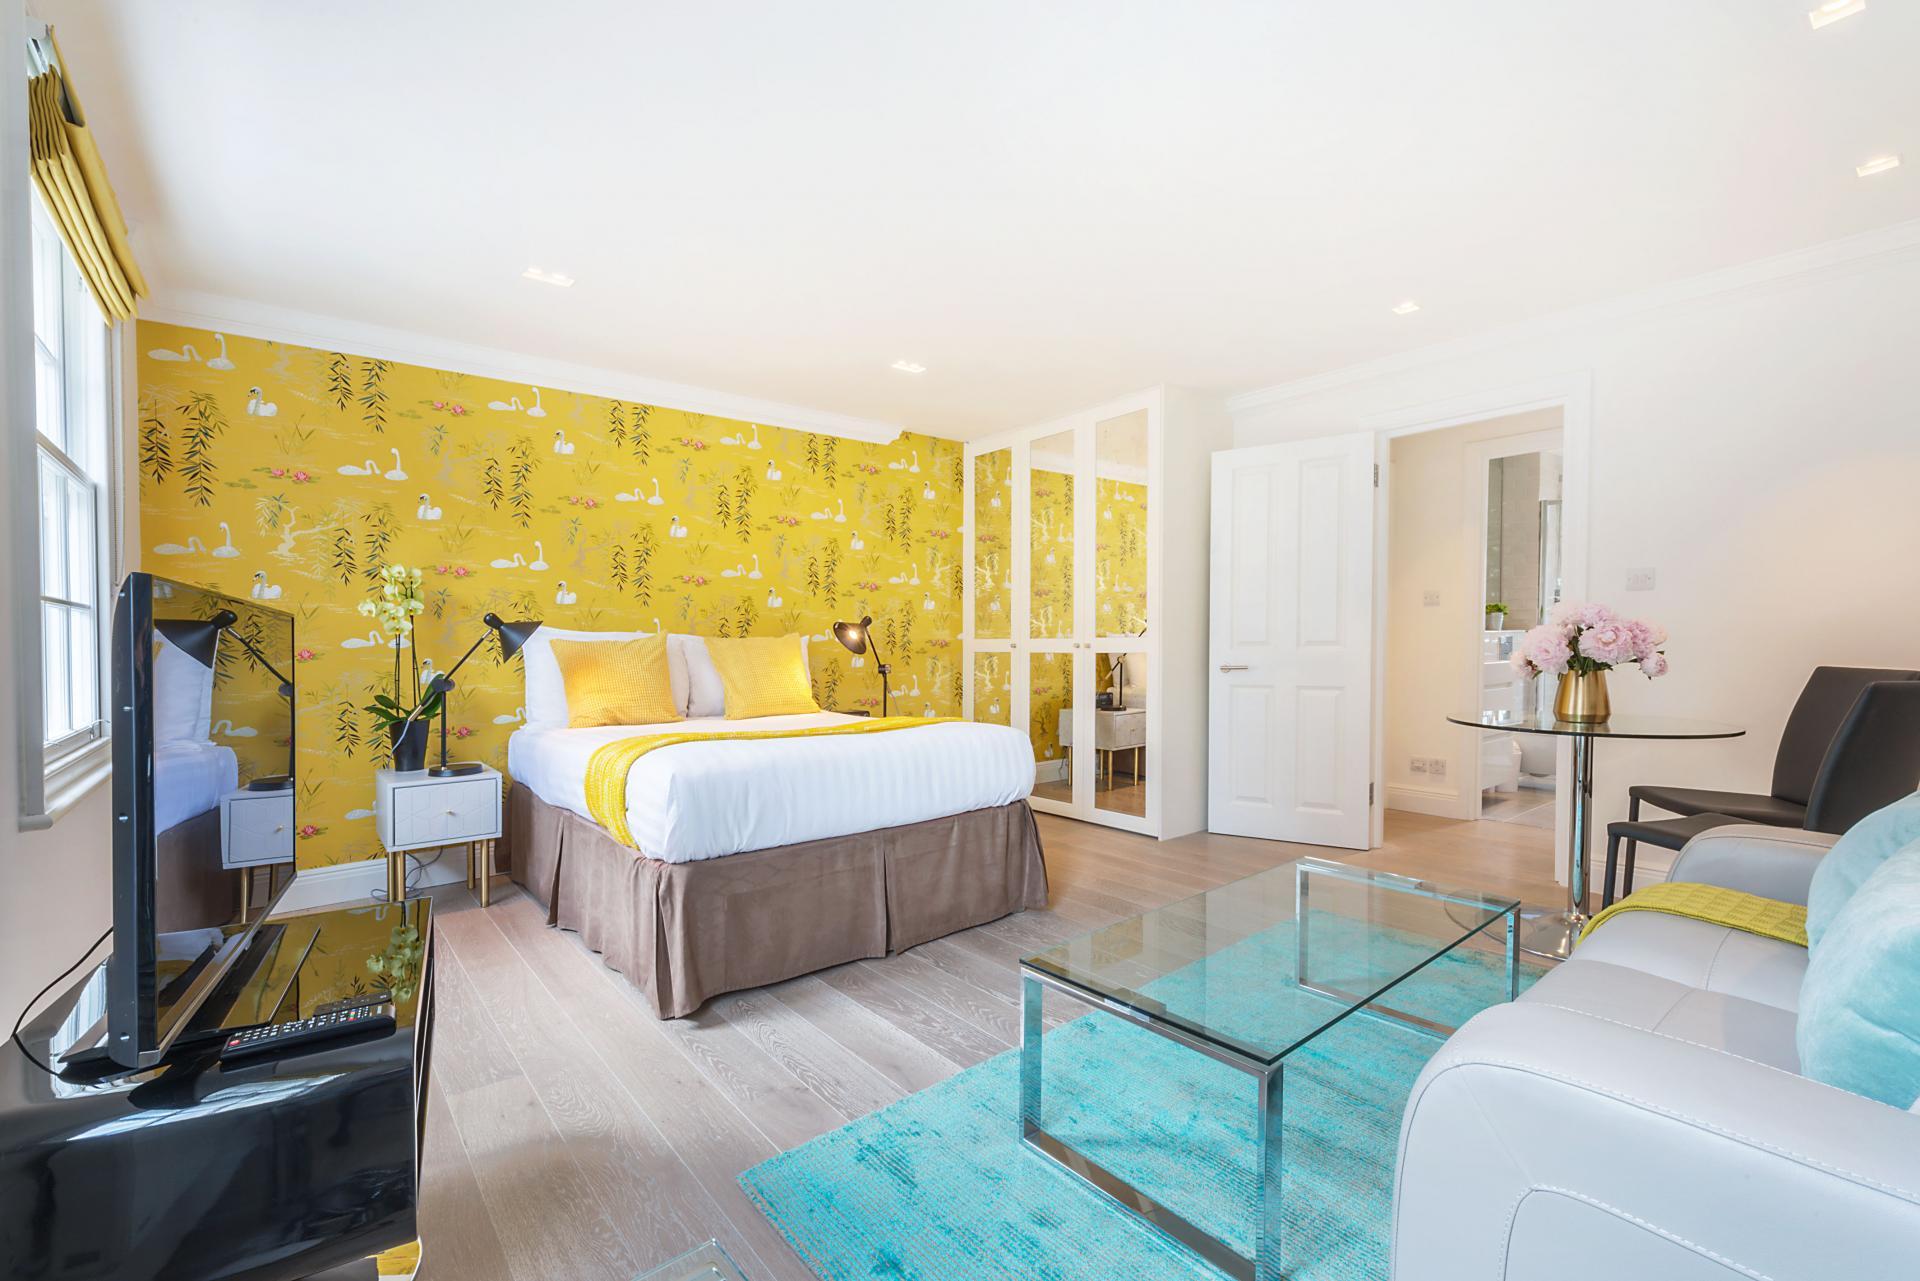 Bed at Marylebone - Wyndham Street Apartments - Citybase Apartments